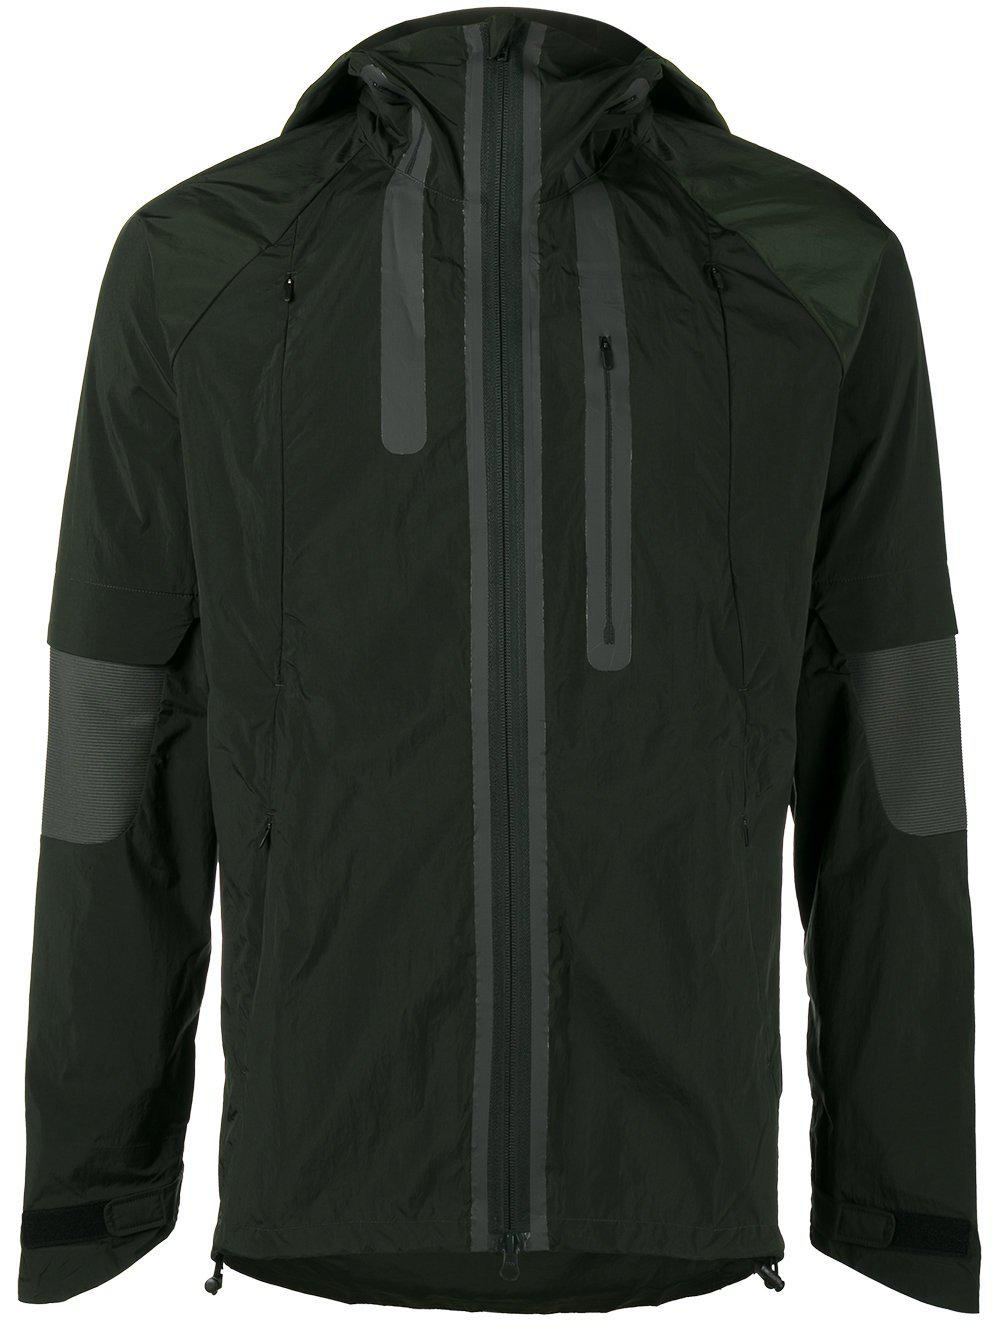 6b3bbd56c Y-3 Nylon Hood Jacket in Green for Men - Lyst